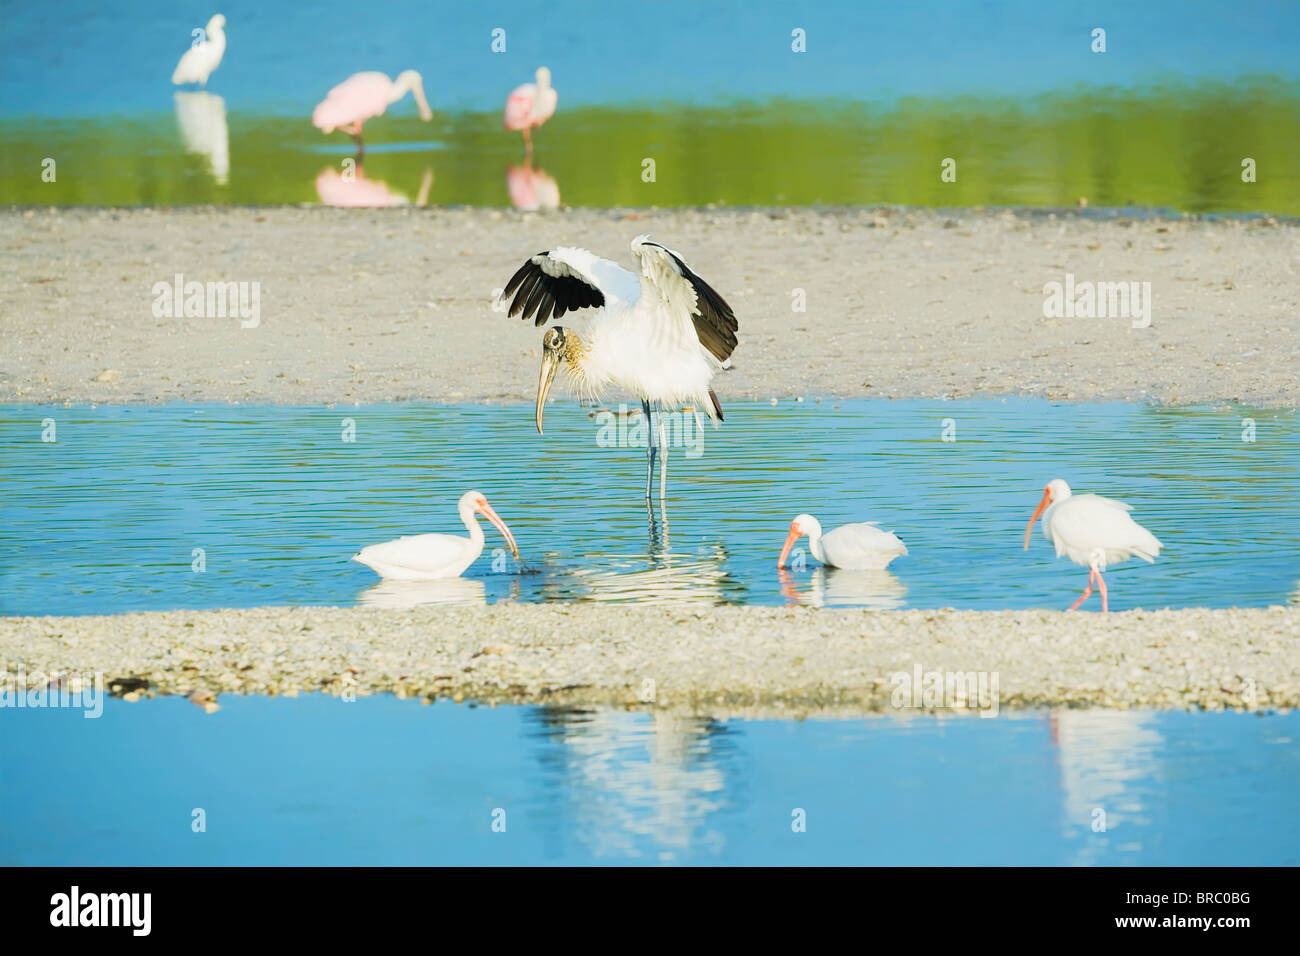 Holz-Storch ausladenden Flügeln und rosige Löffler, Sanibel Island, J. N. Ding Darling National Wildlife Stockbild